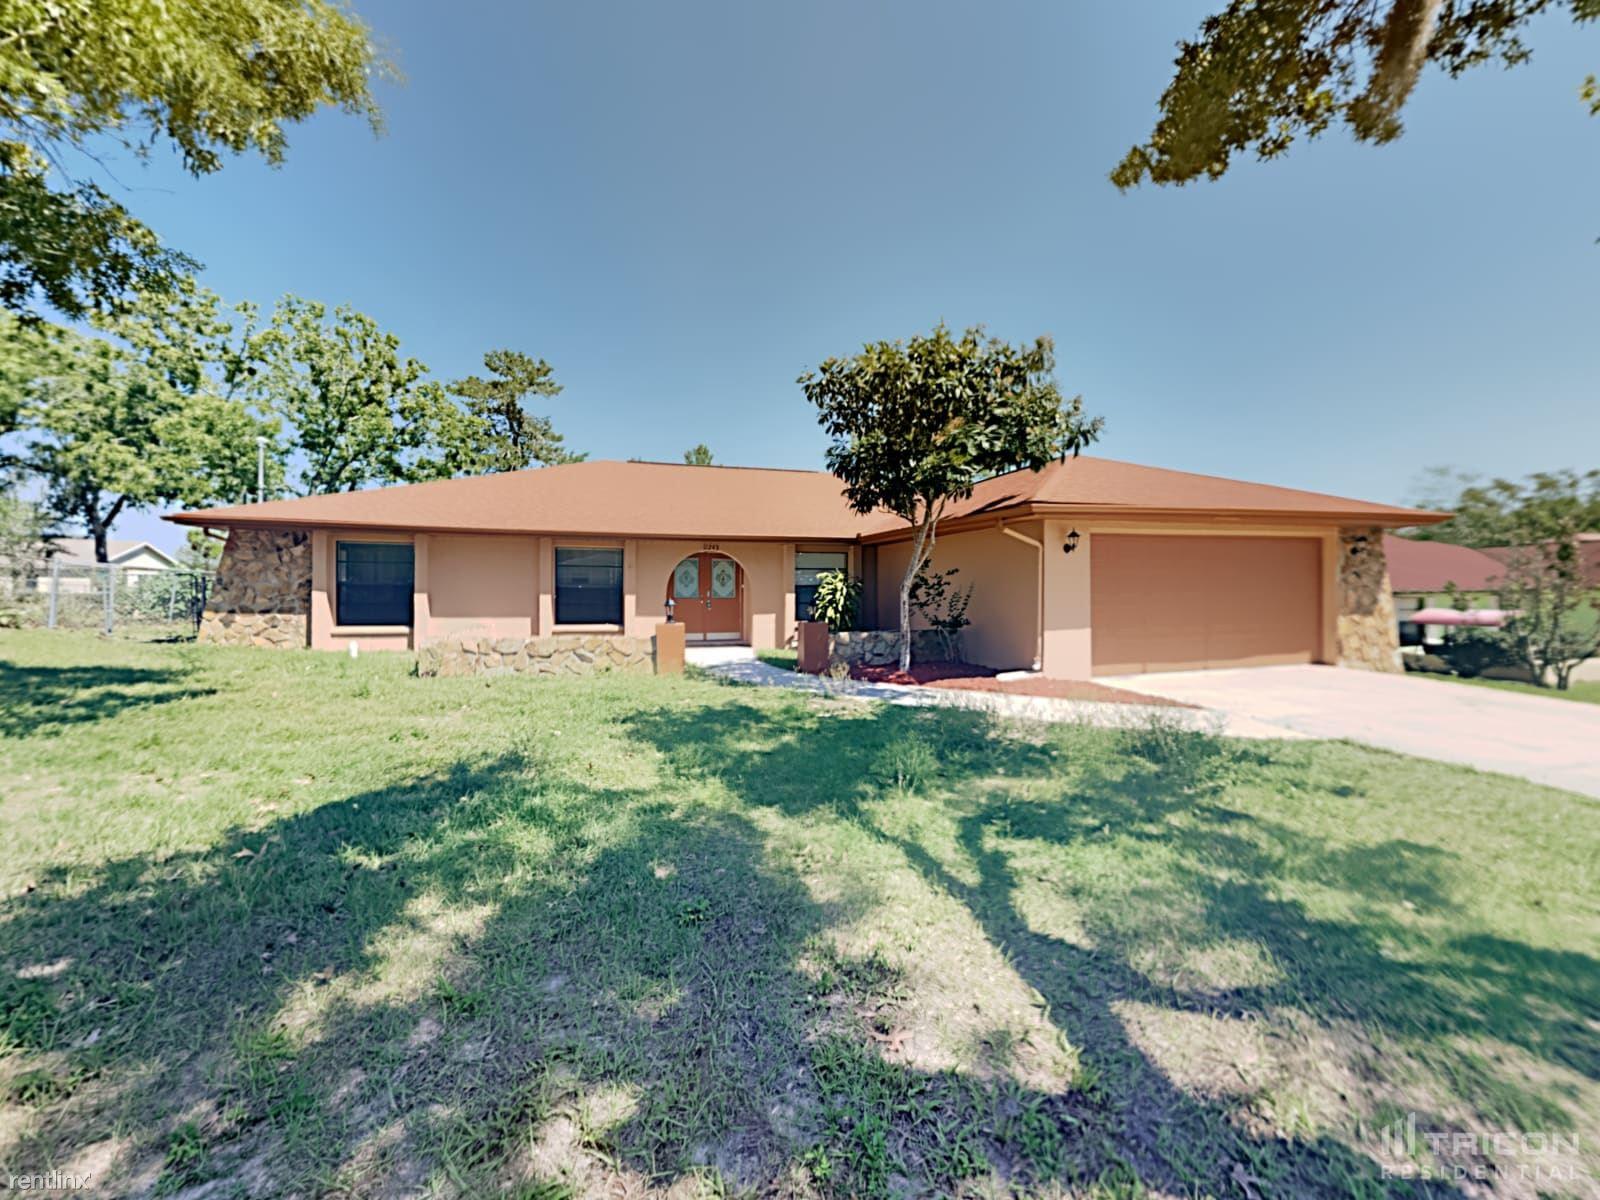 11243 Homeway Street, Spring Hill, FL - $1,750 USD/ month